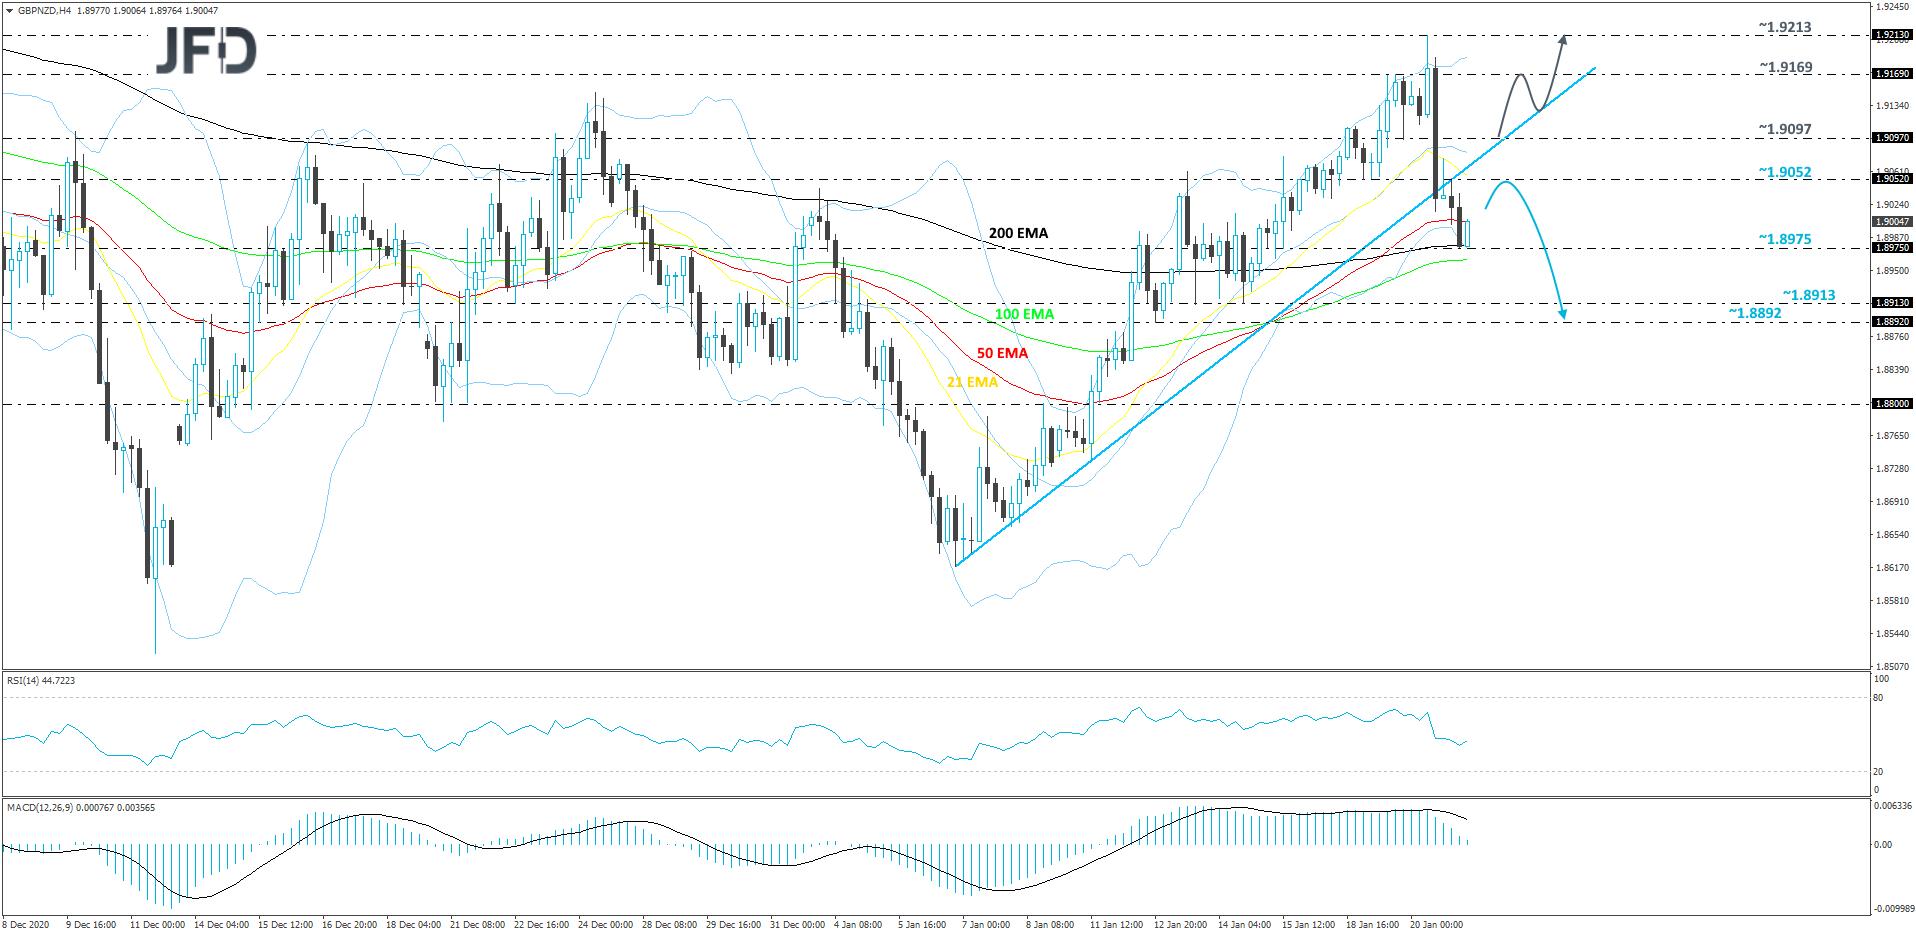 GBP/NZD 4-hour chart technical analysis